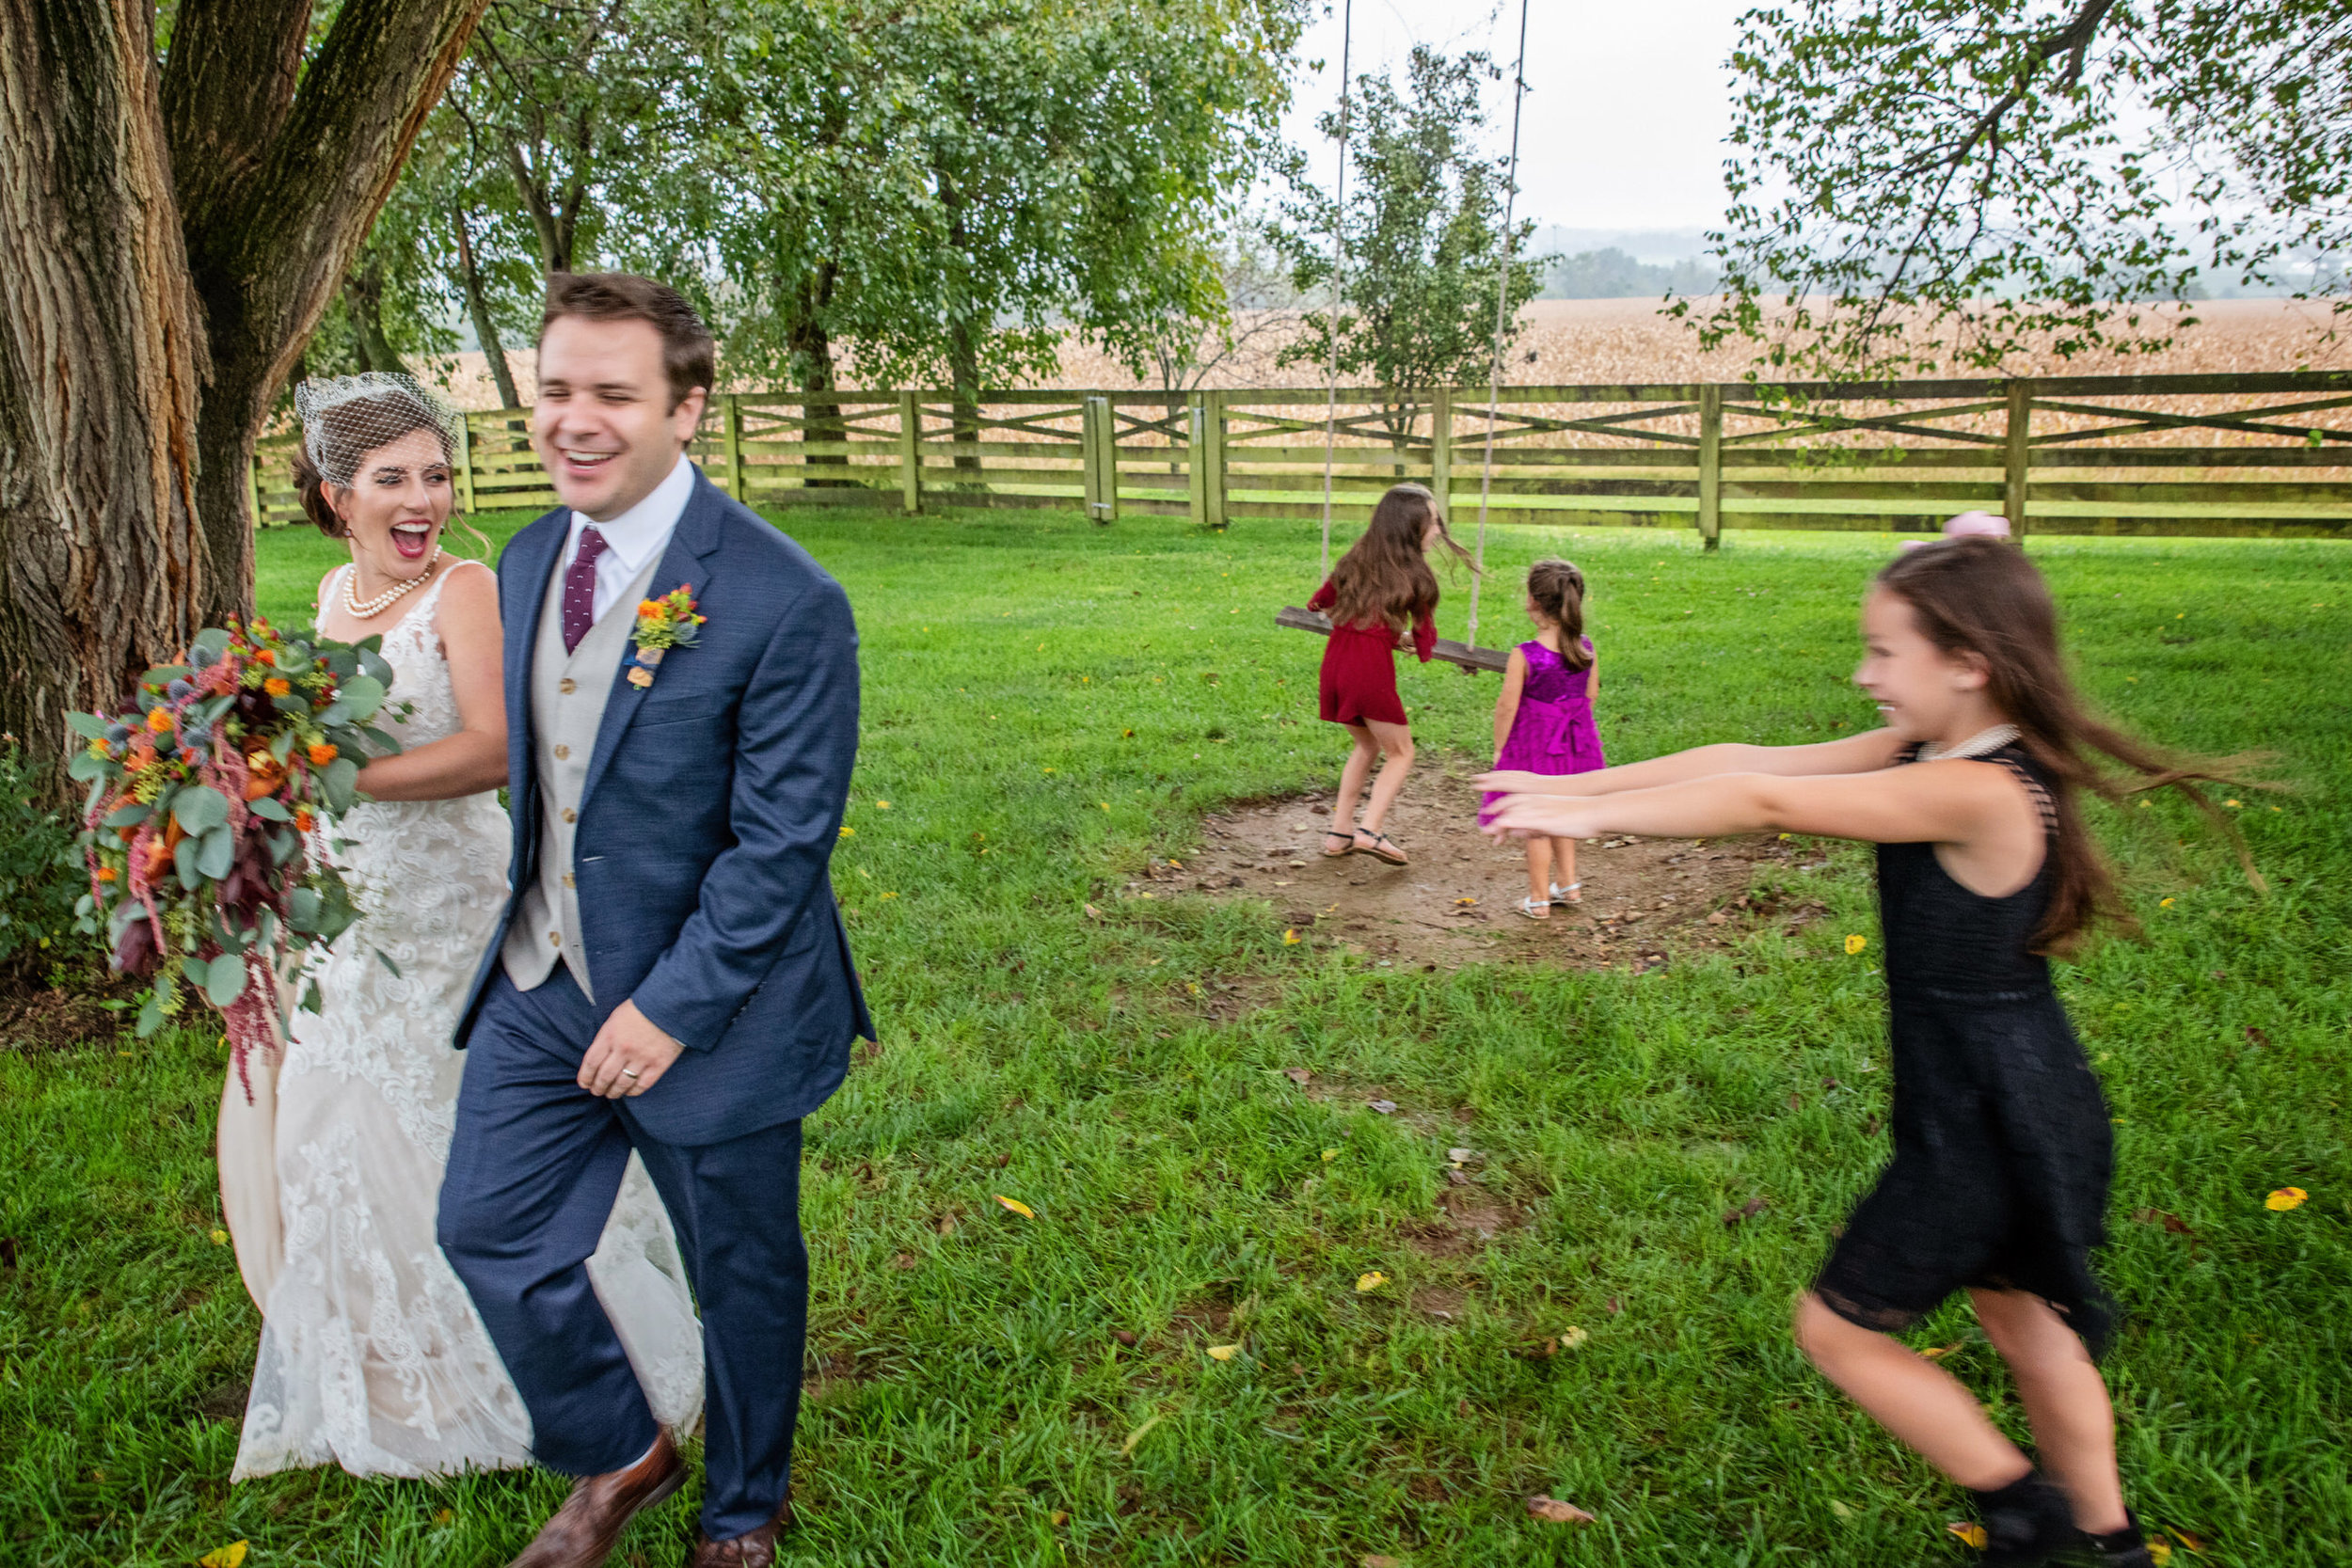 WalkersOverlookWedding-Angela&Ben-WeddingParty-21.jpg